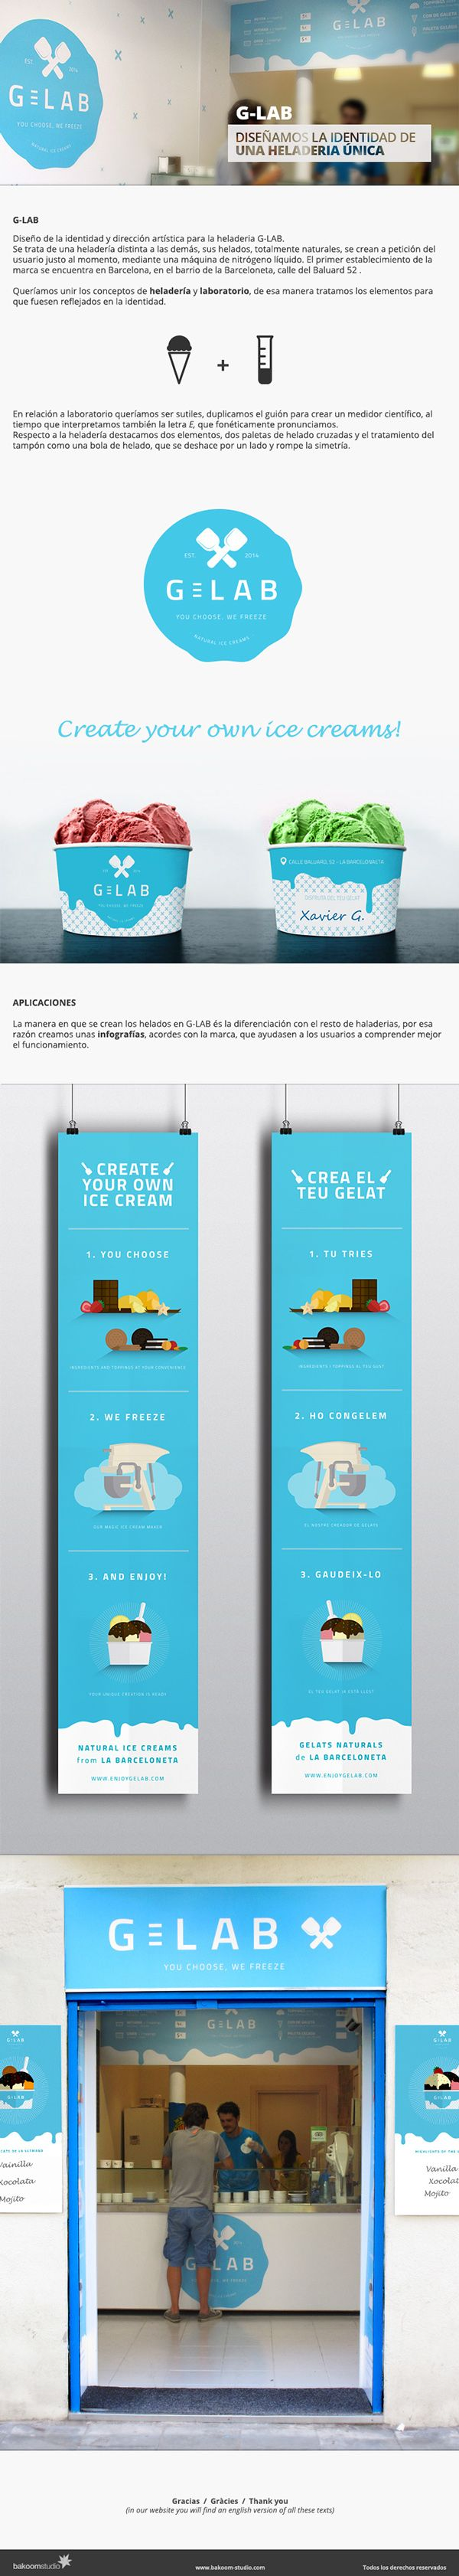 Identity design and art direction for G-LAB, ice cream shop. #icecreams #design #logo